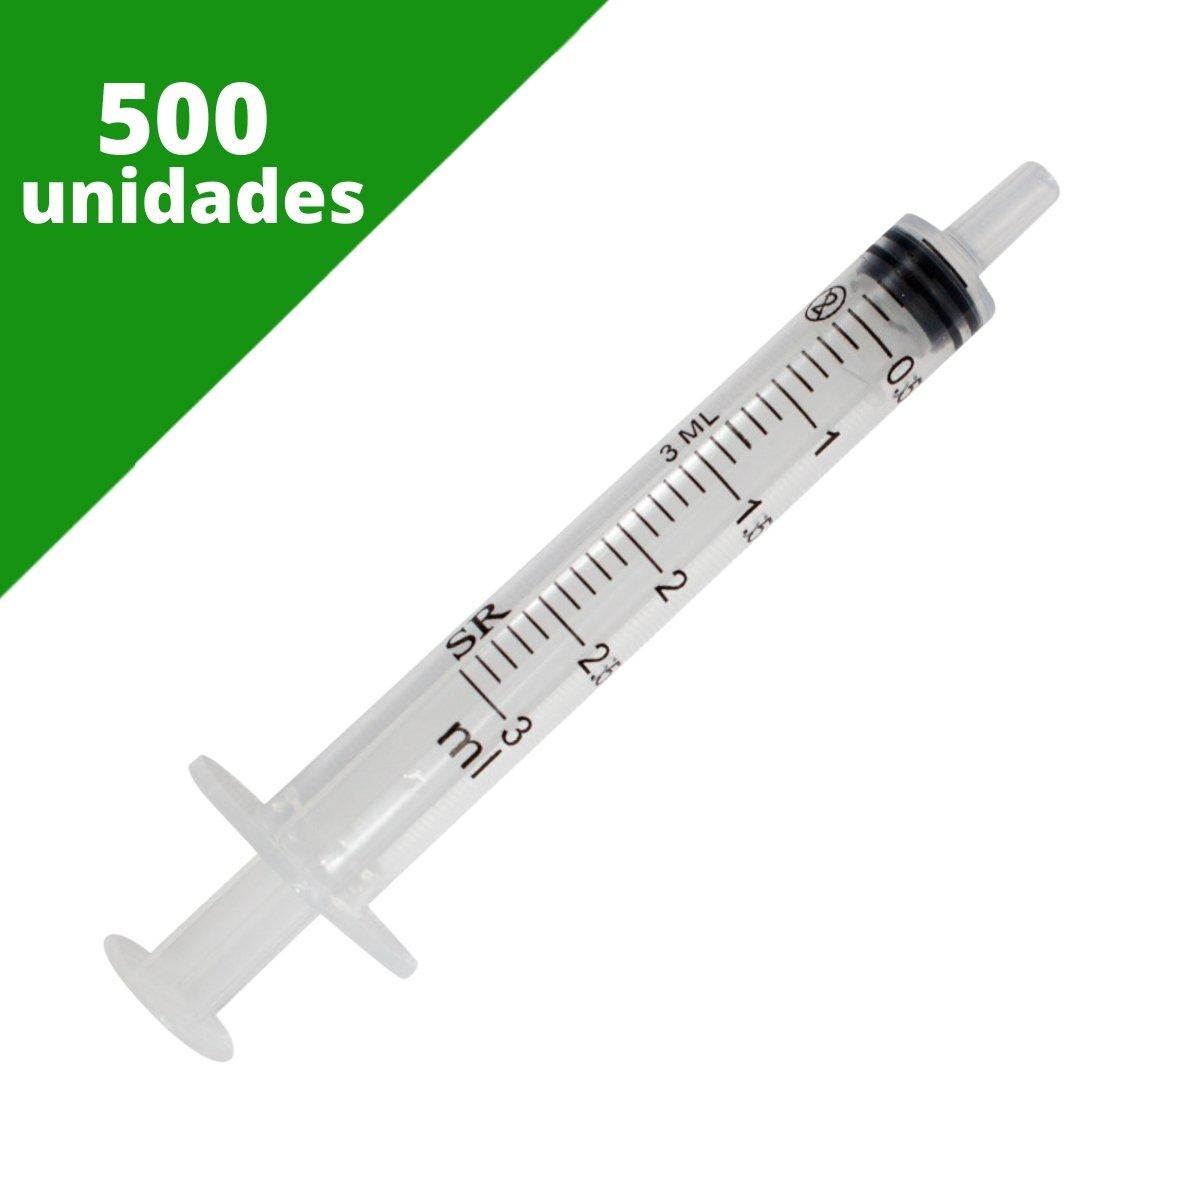 SERINGA DESCARTÁVEL 03 ML SEM AGULHA BICO SLIP (C/500) - SR